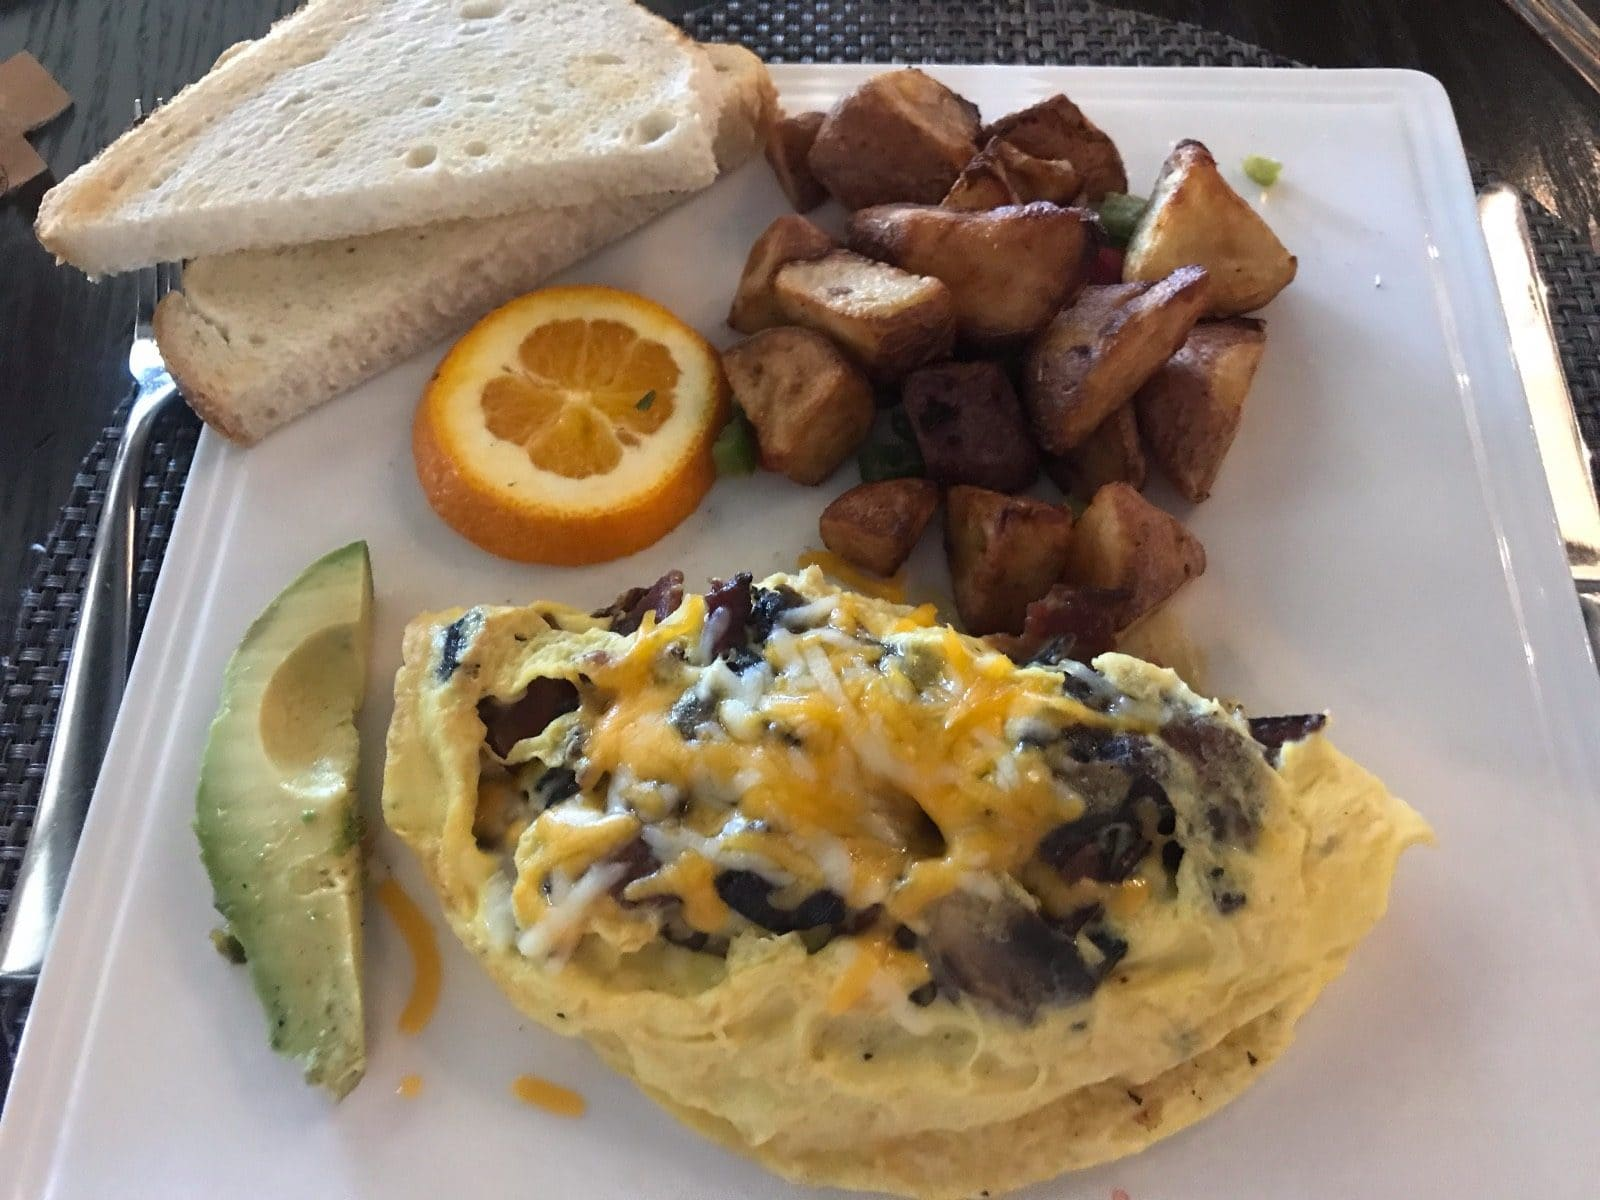 breakfast at hotel in death valley